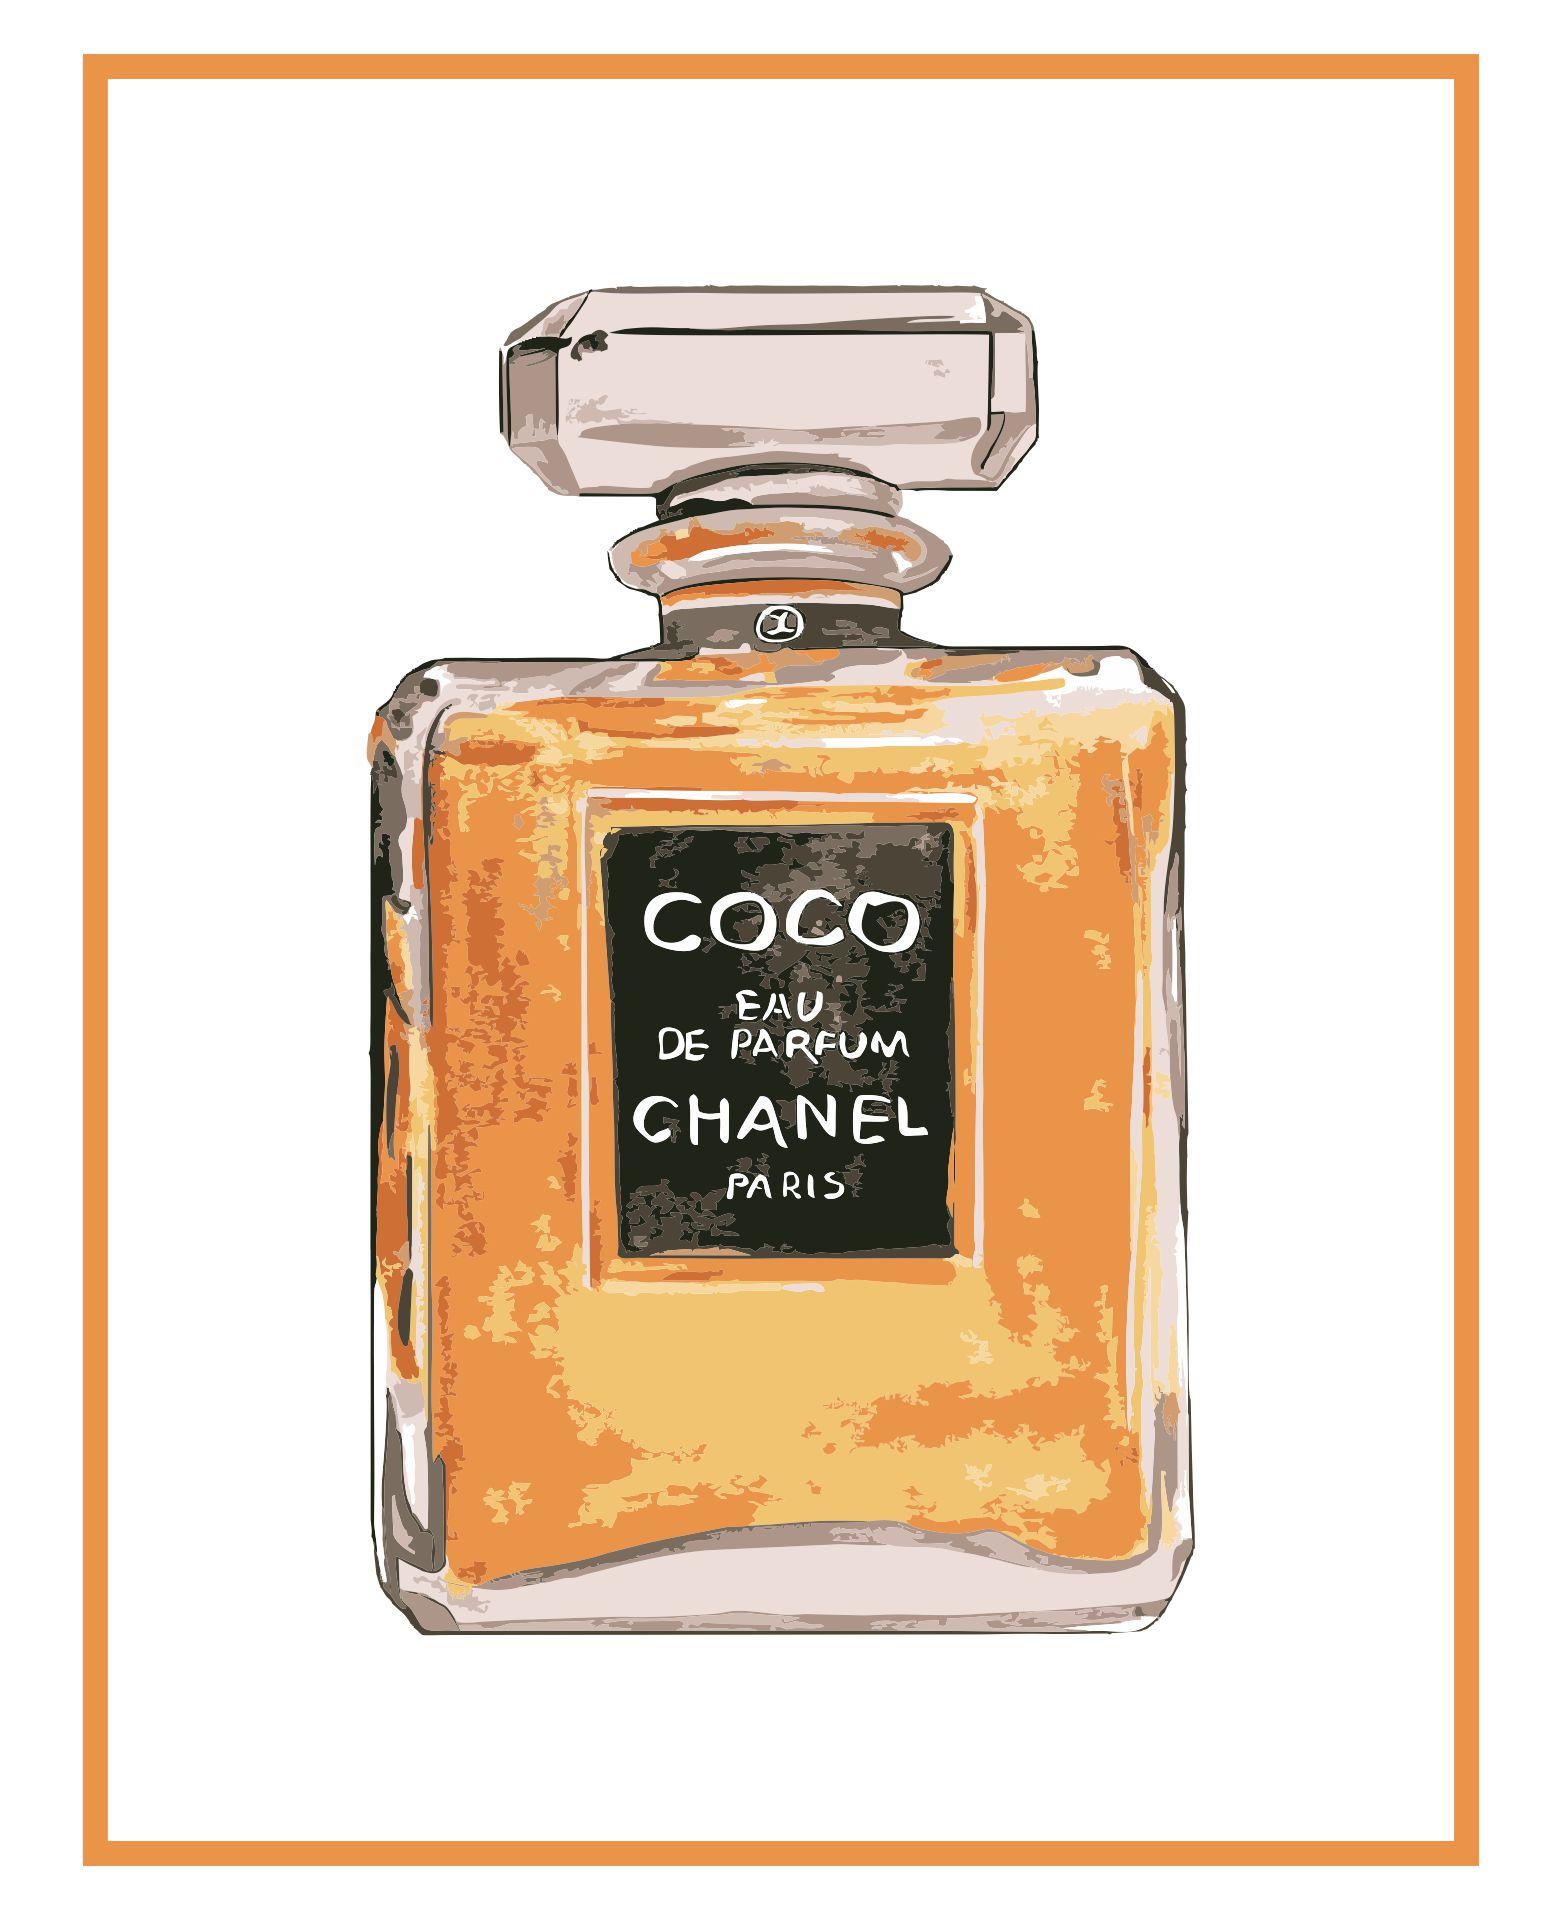 Chanel Wall Art and Decor